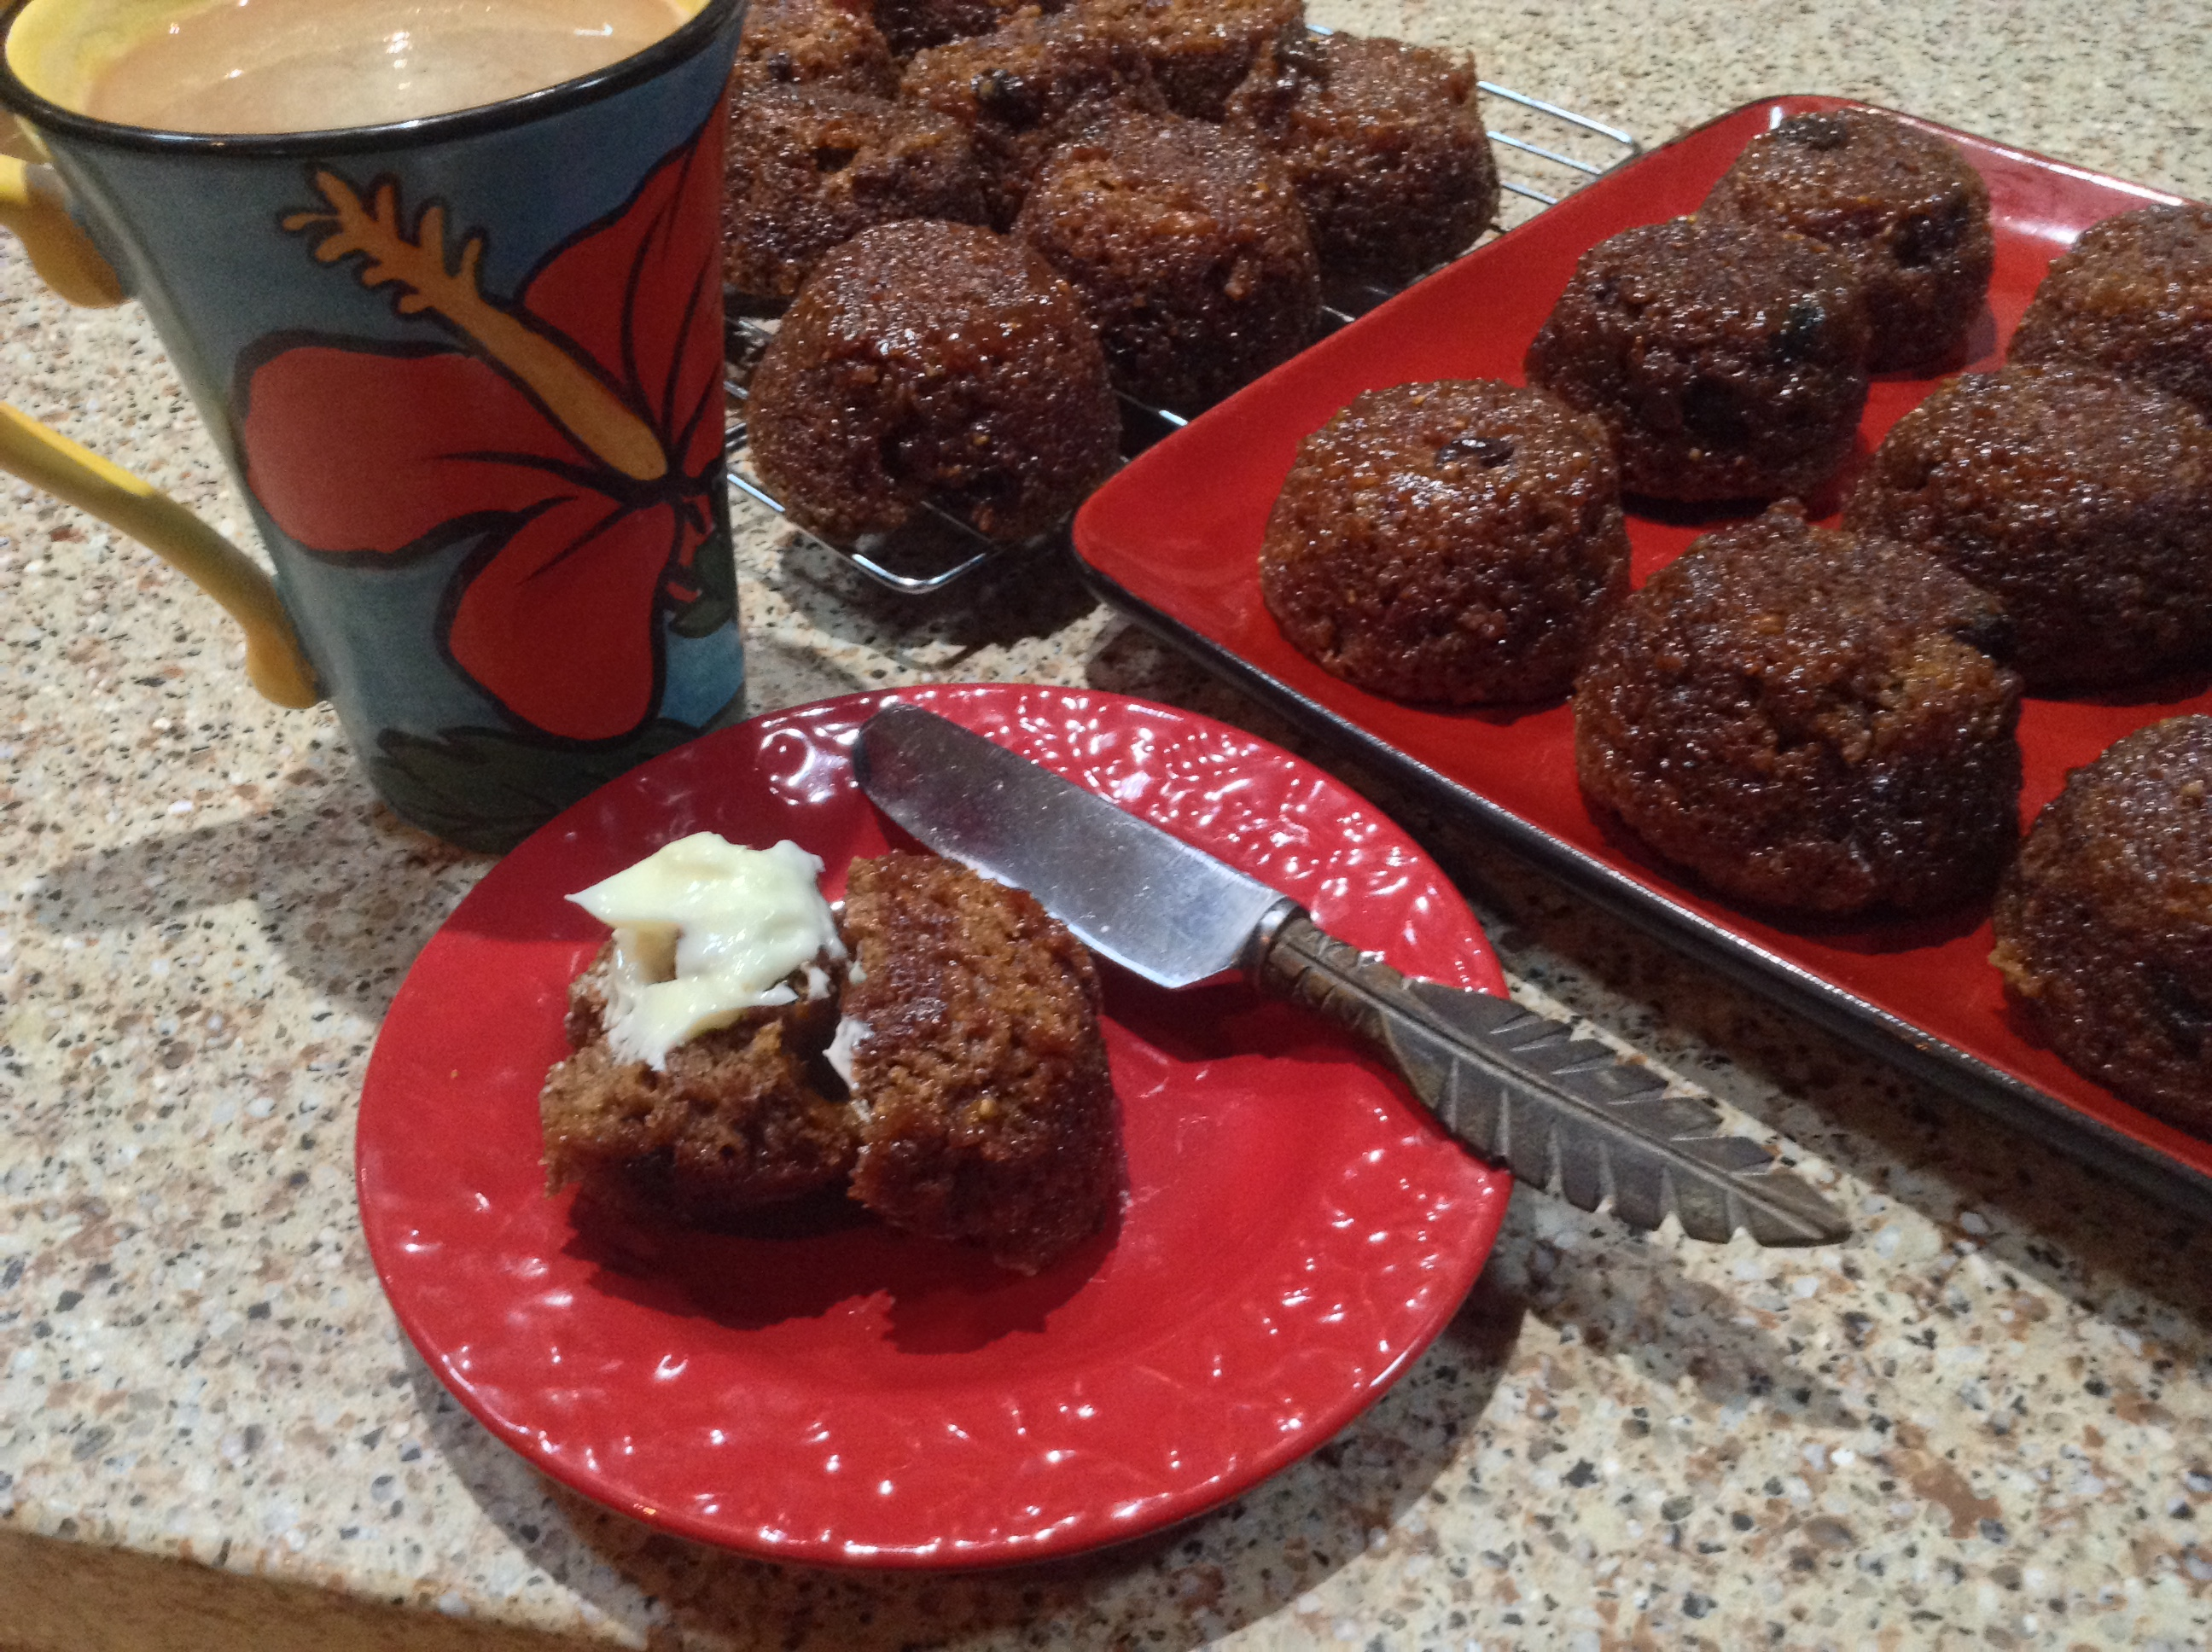 Mimi S Cafe Honey Bran Muffin